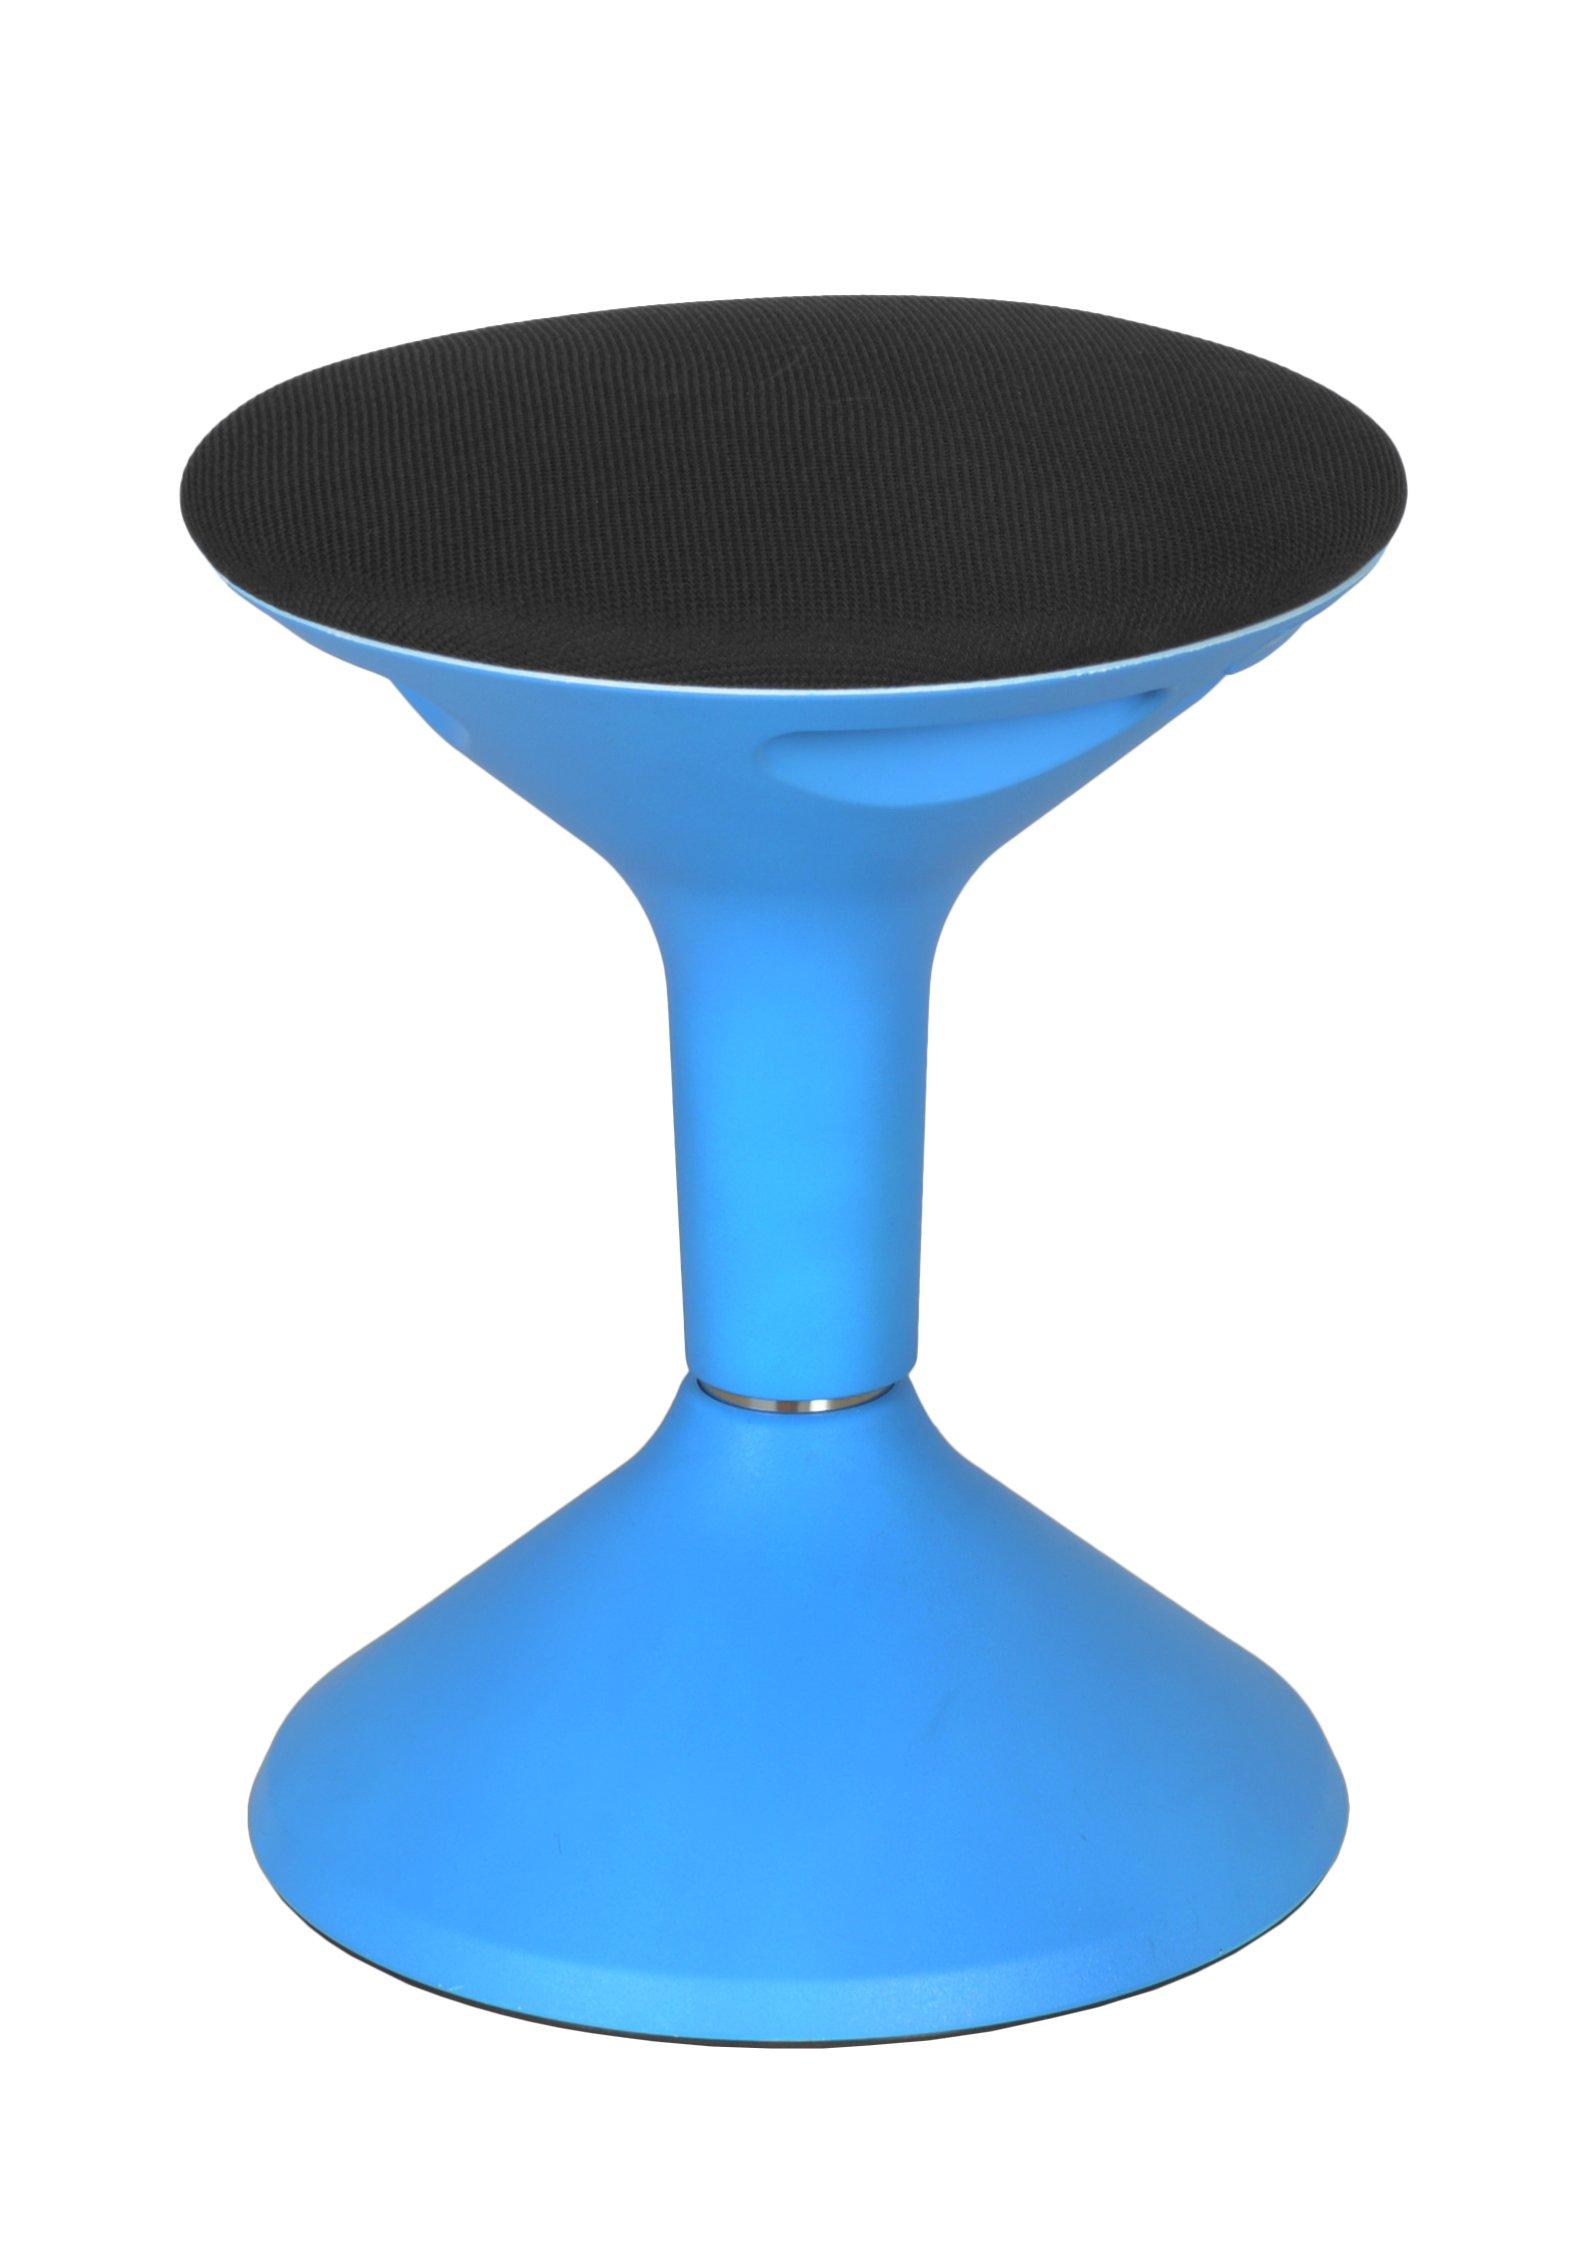 Regency 1700BE Grow Height Adjustable Stool, Blue